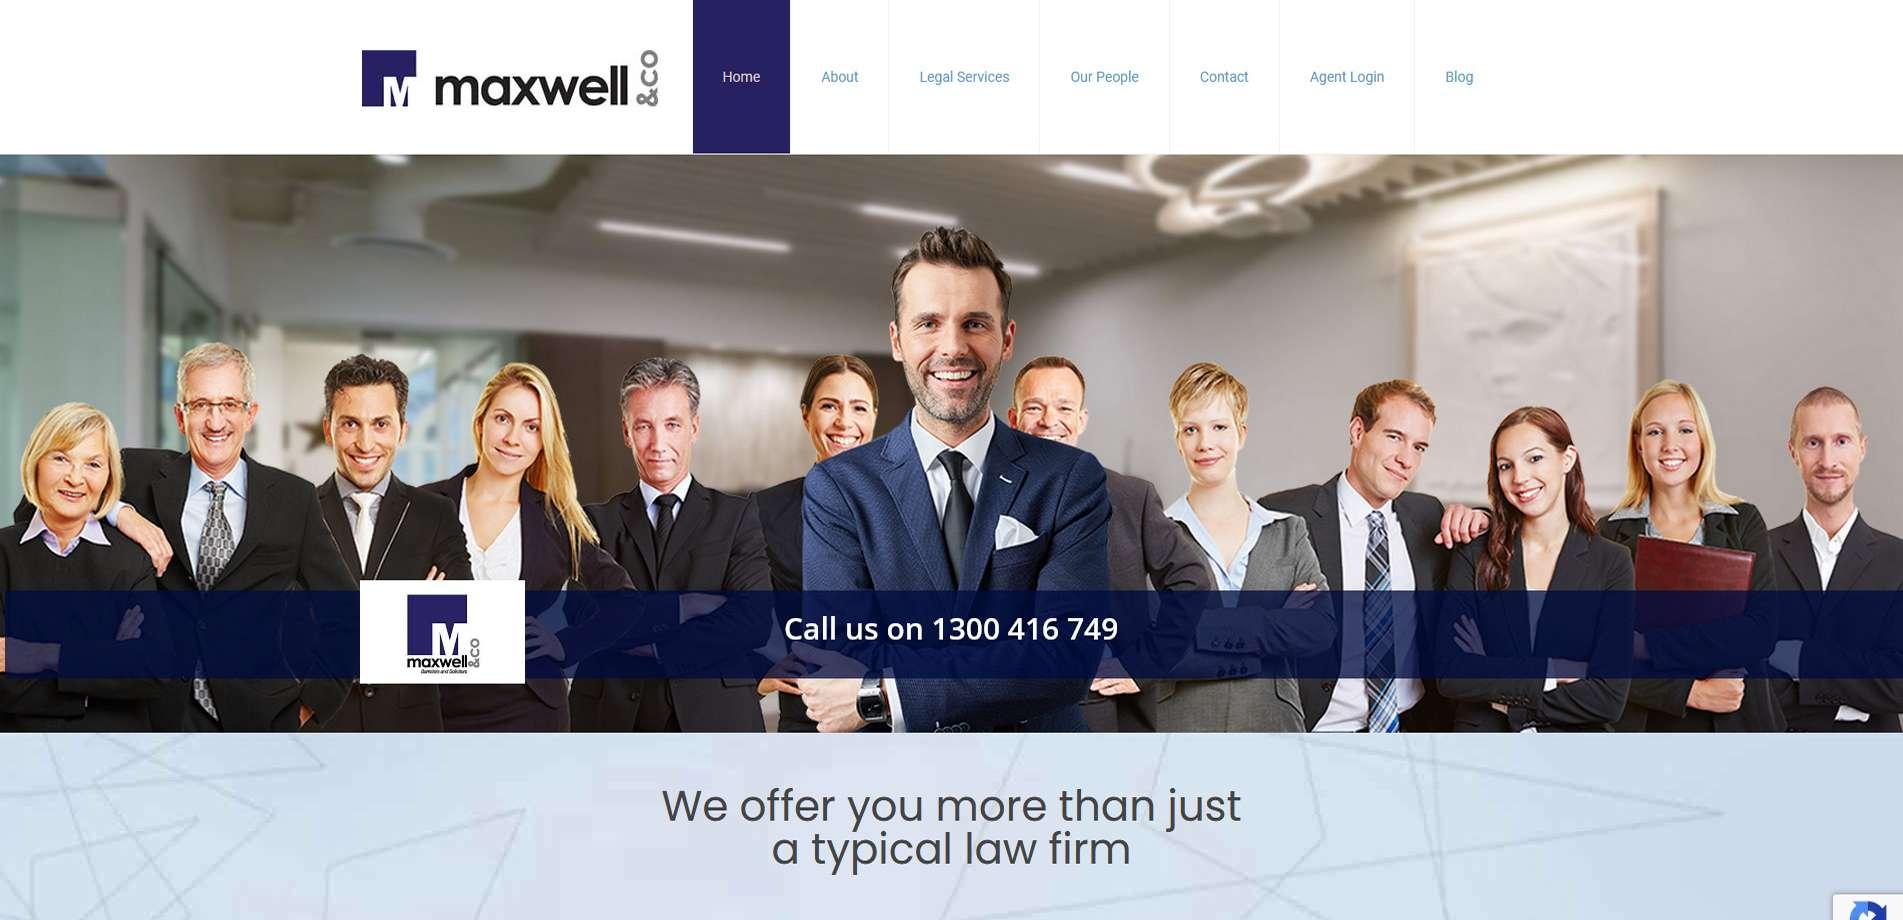 maxwellco canberra web design